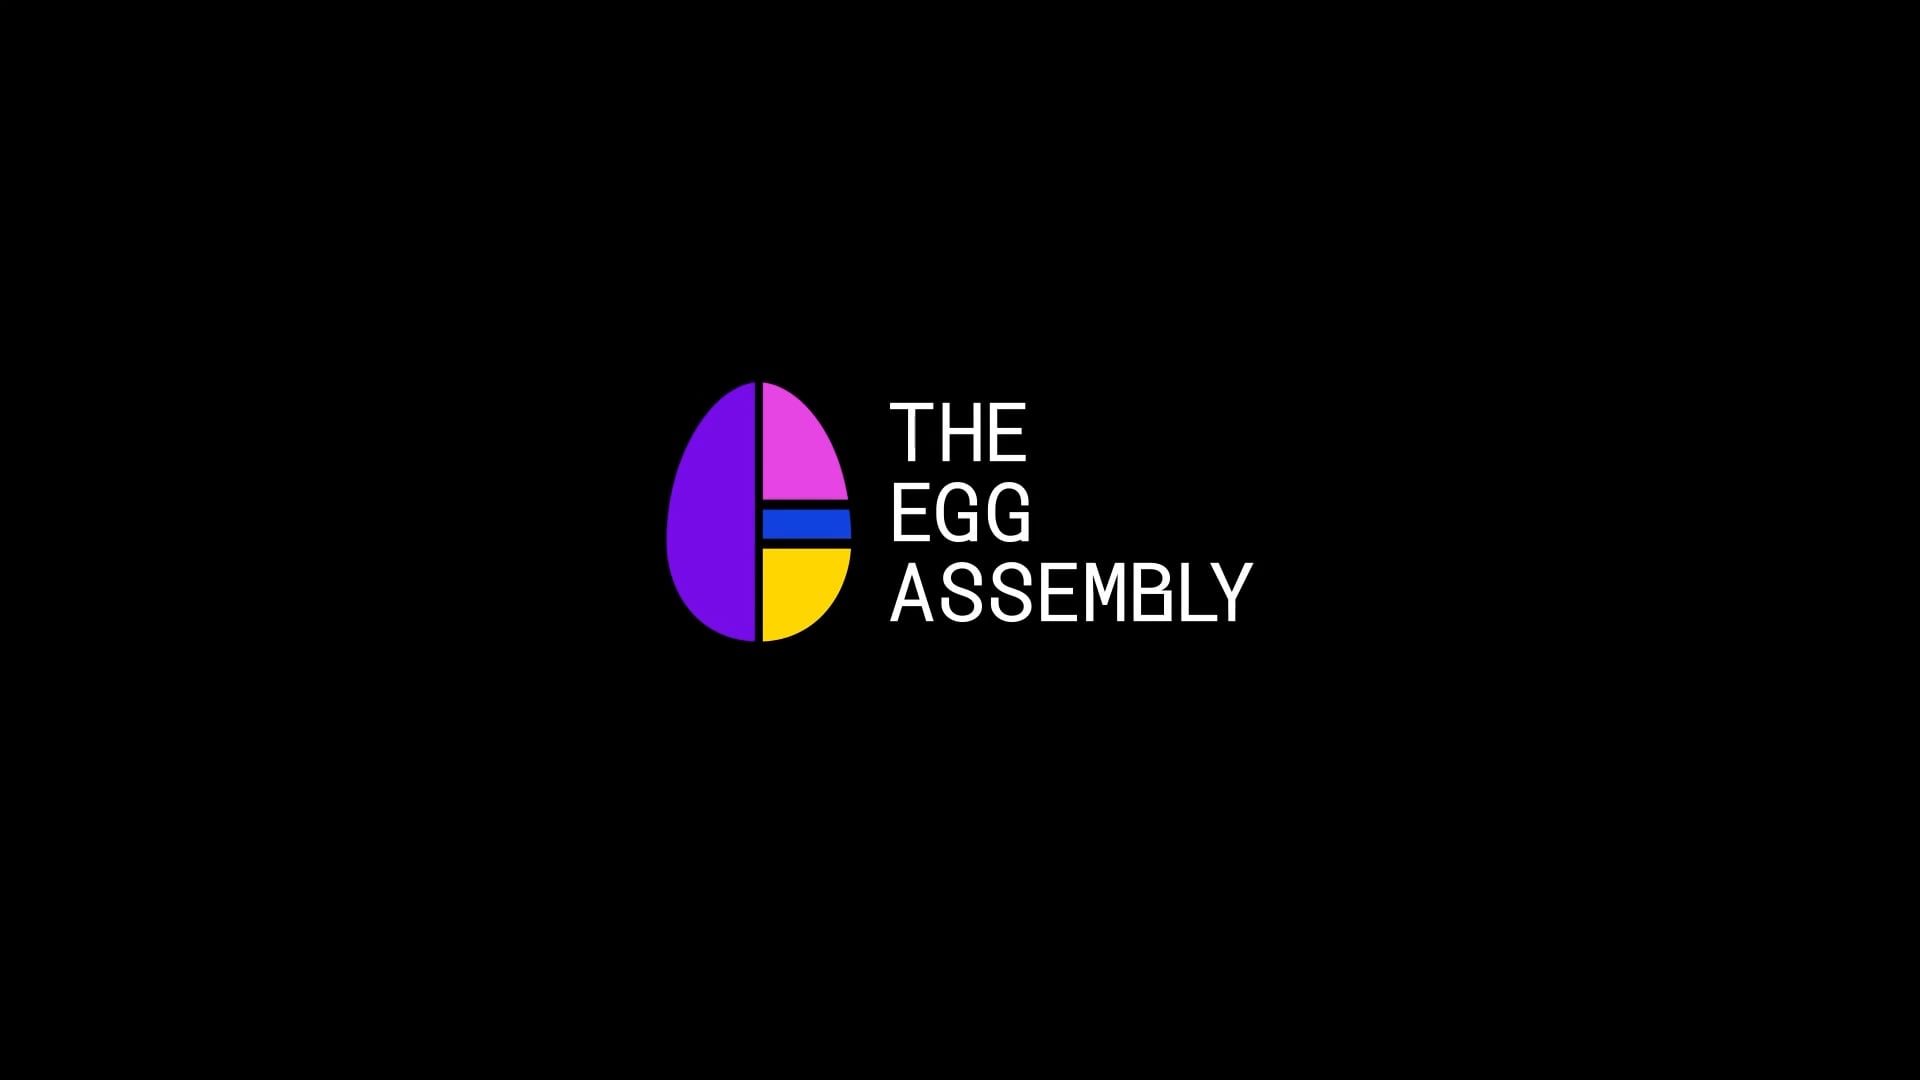 The Egg Assembly